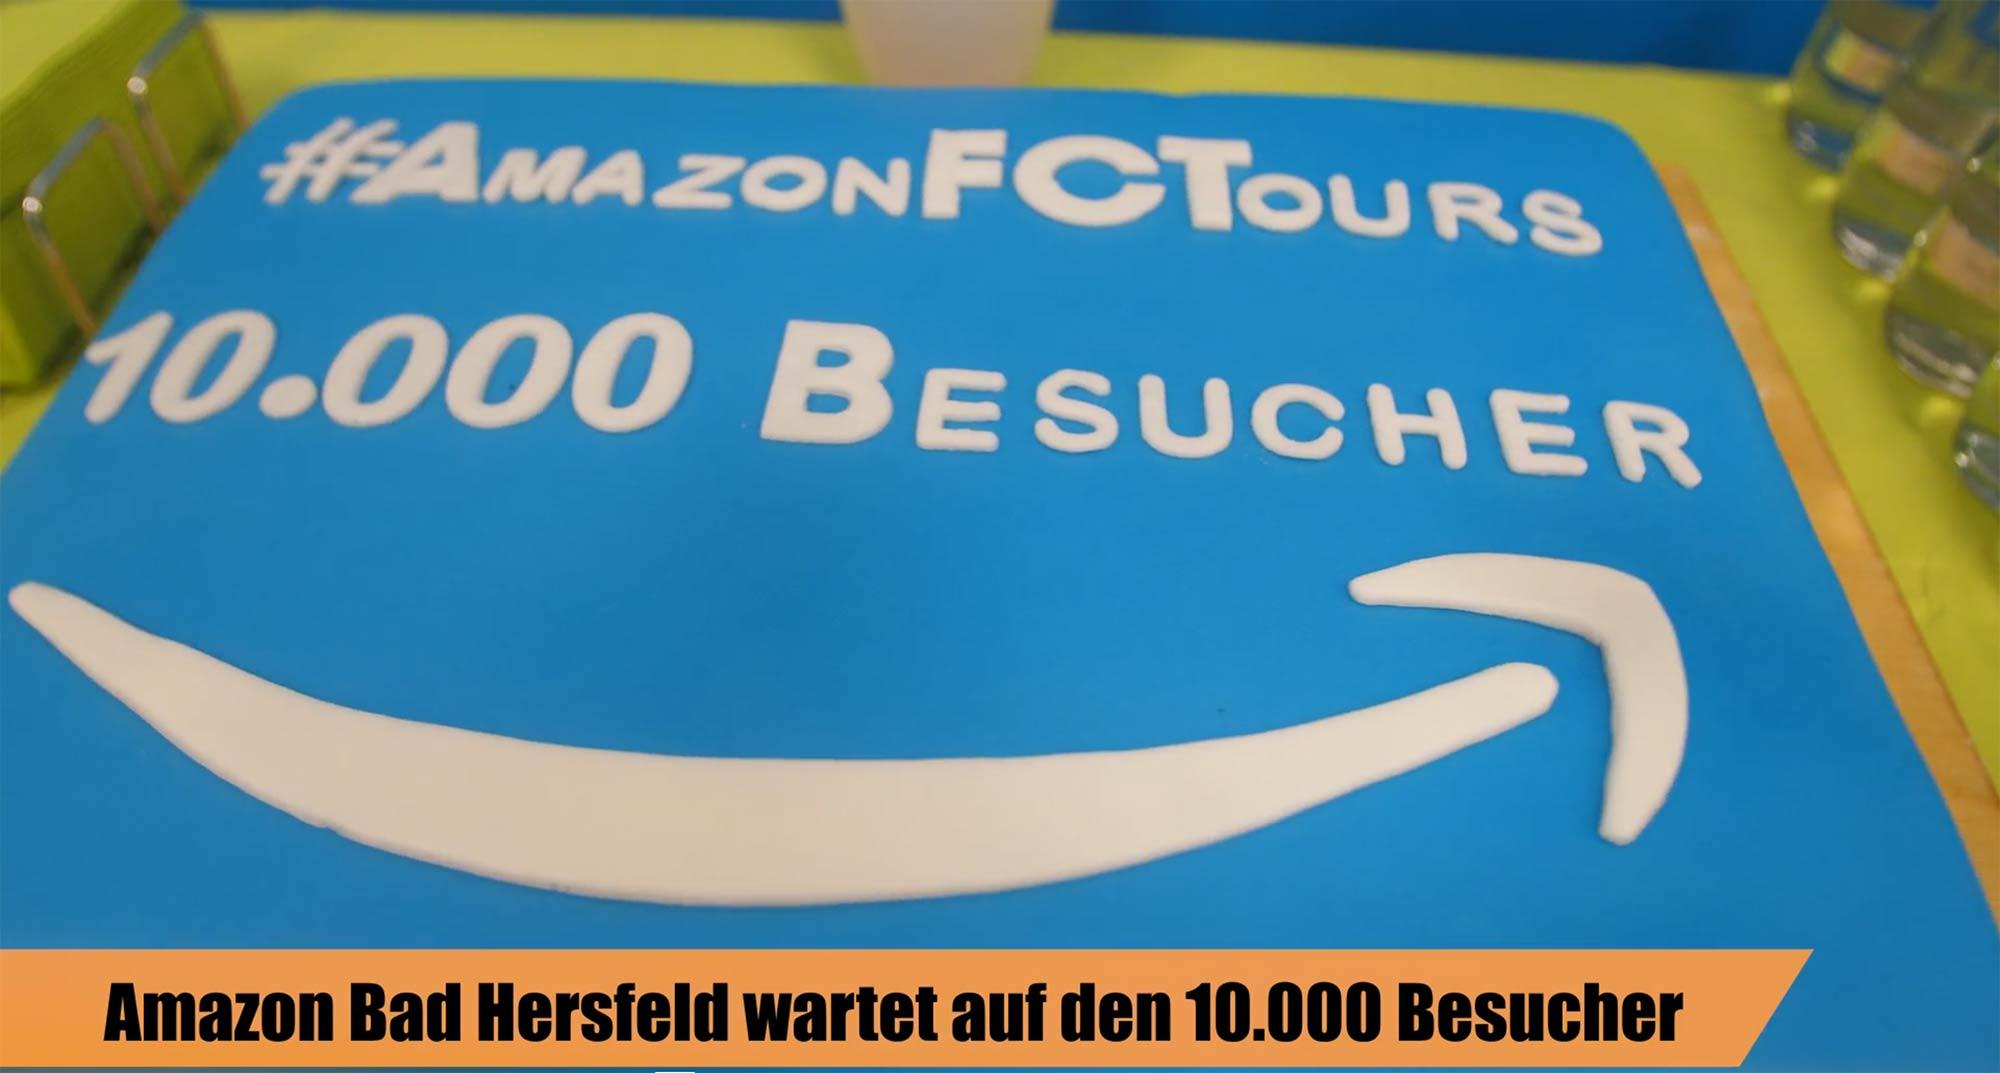 Amazon Bad-Hersfeld feiert den 10.000 Besucher